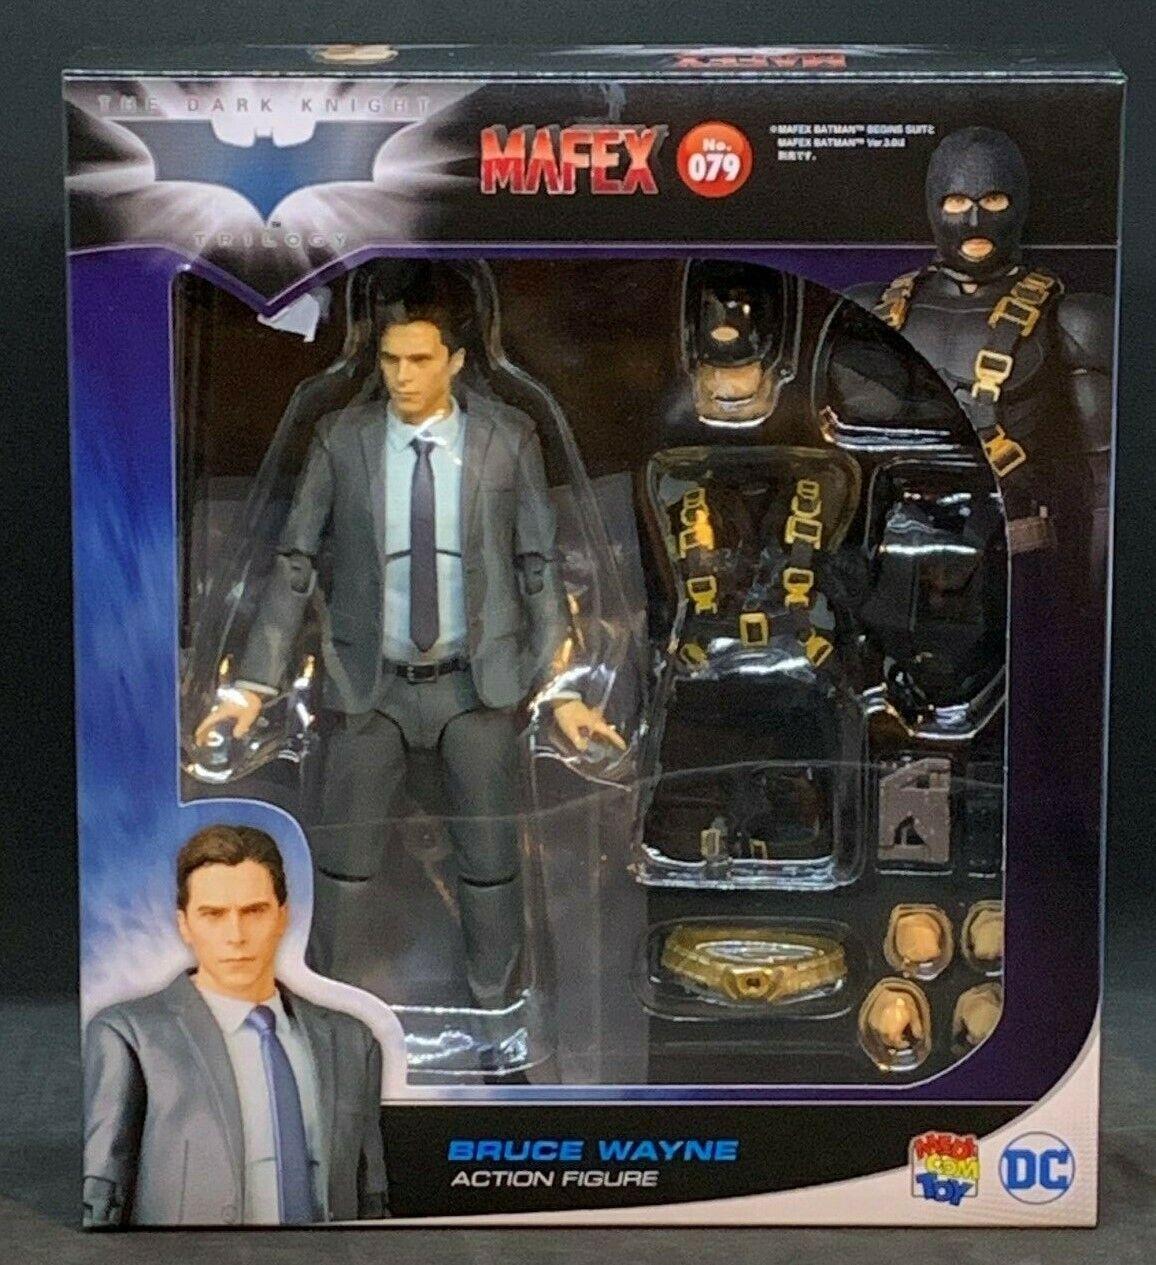 Medicom MAFEX Bruce Wayne - The Dark Knight Trilogy Ver. No. 079